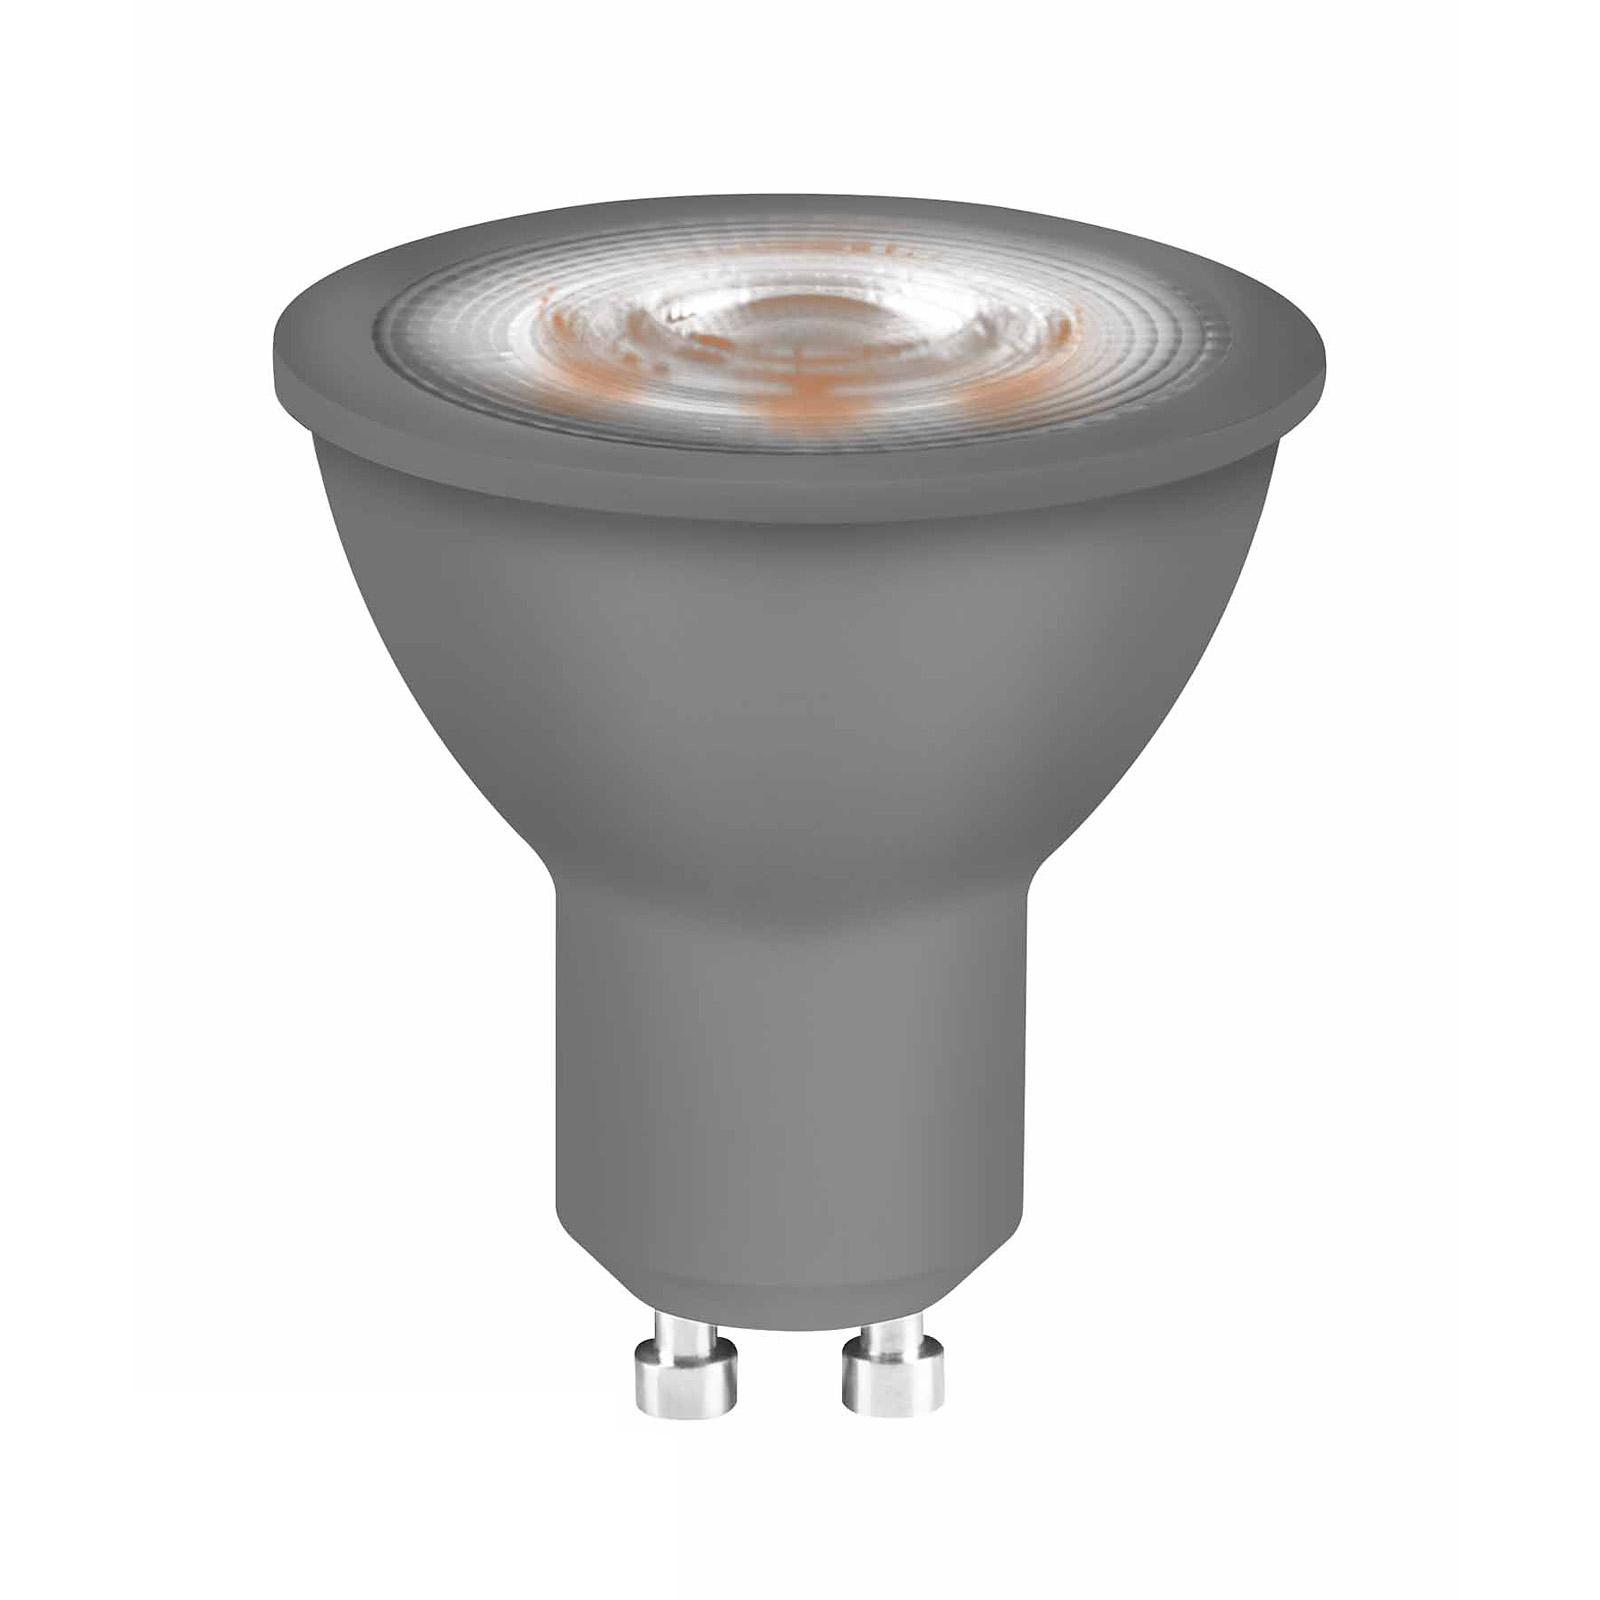 neolux led spot gu10 par16 4w ersatz f r 35 watt 230 lumen 36 warmwei. Black Bedroom Furniture Sets. Home Design Ideas